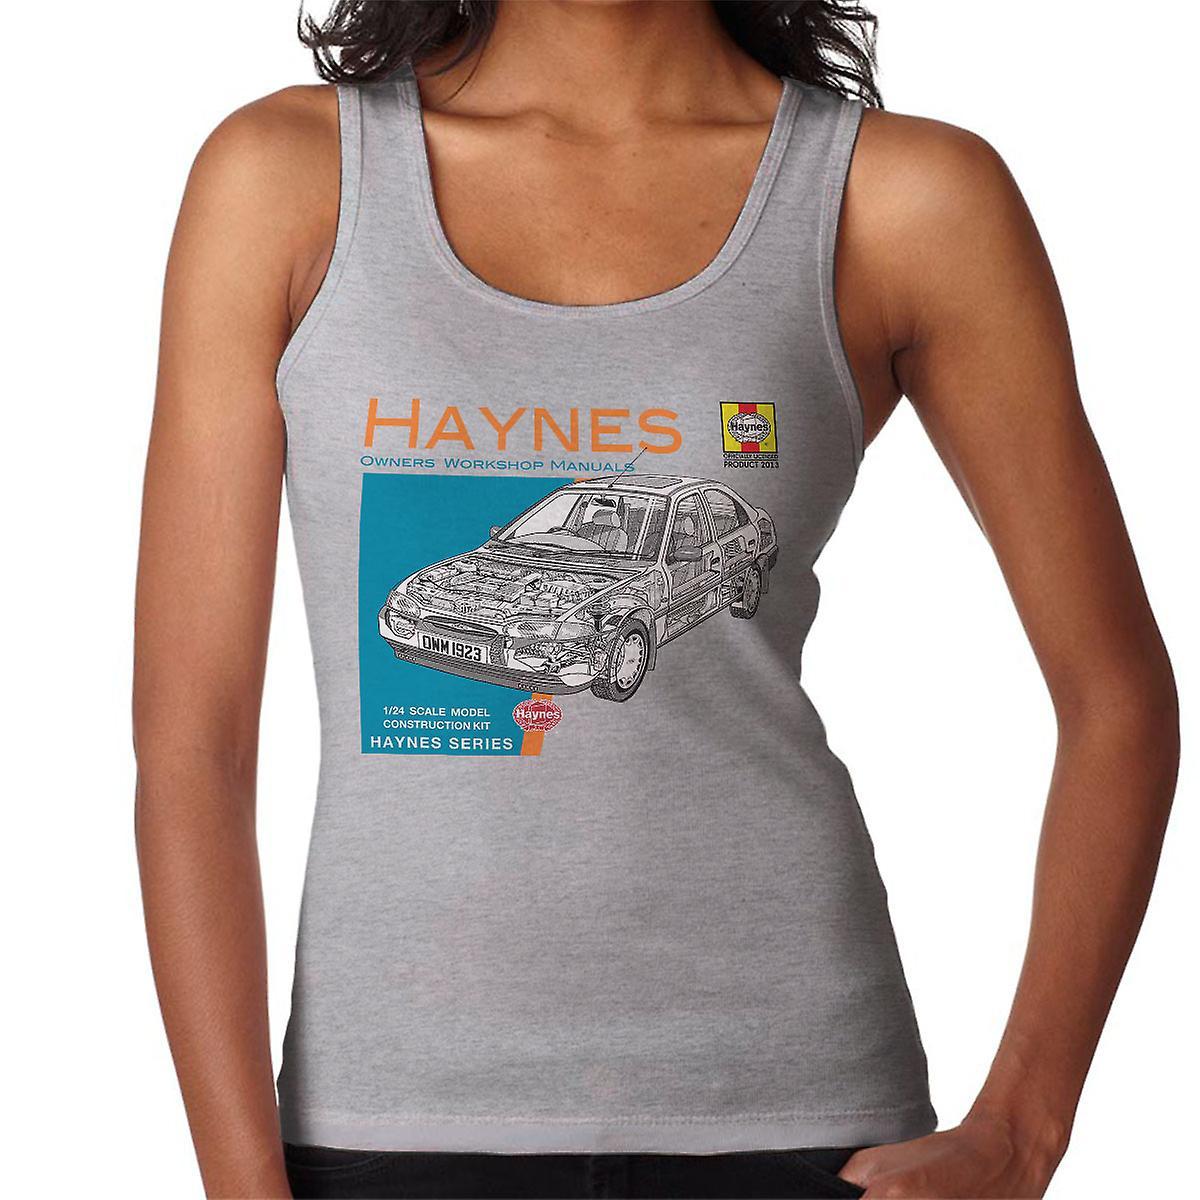 haynes owners workshop manual  ford mondeo womens